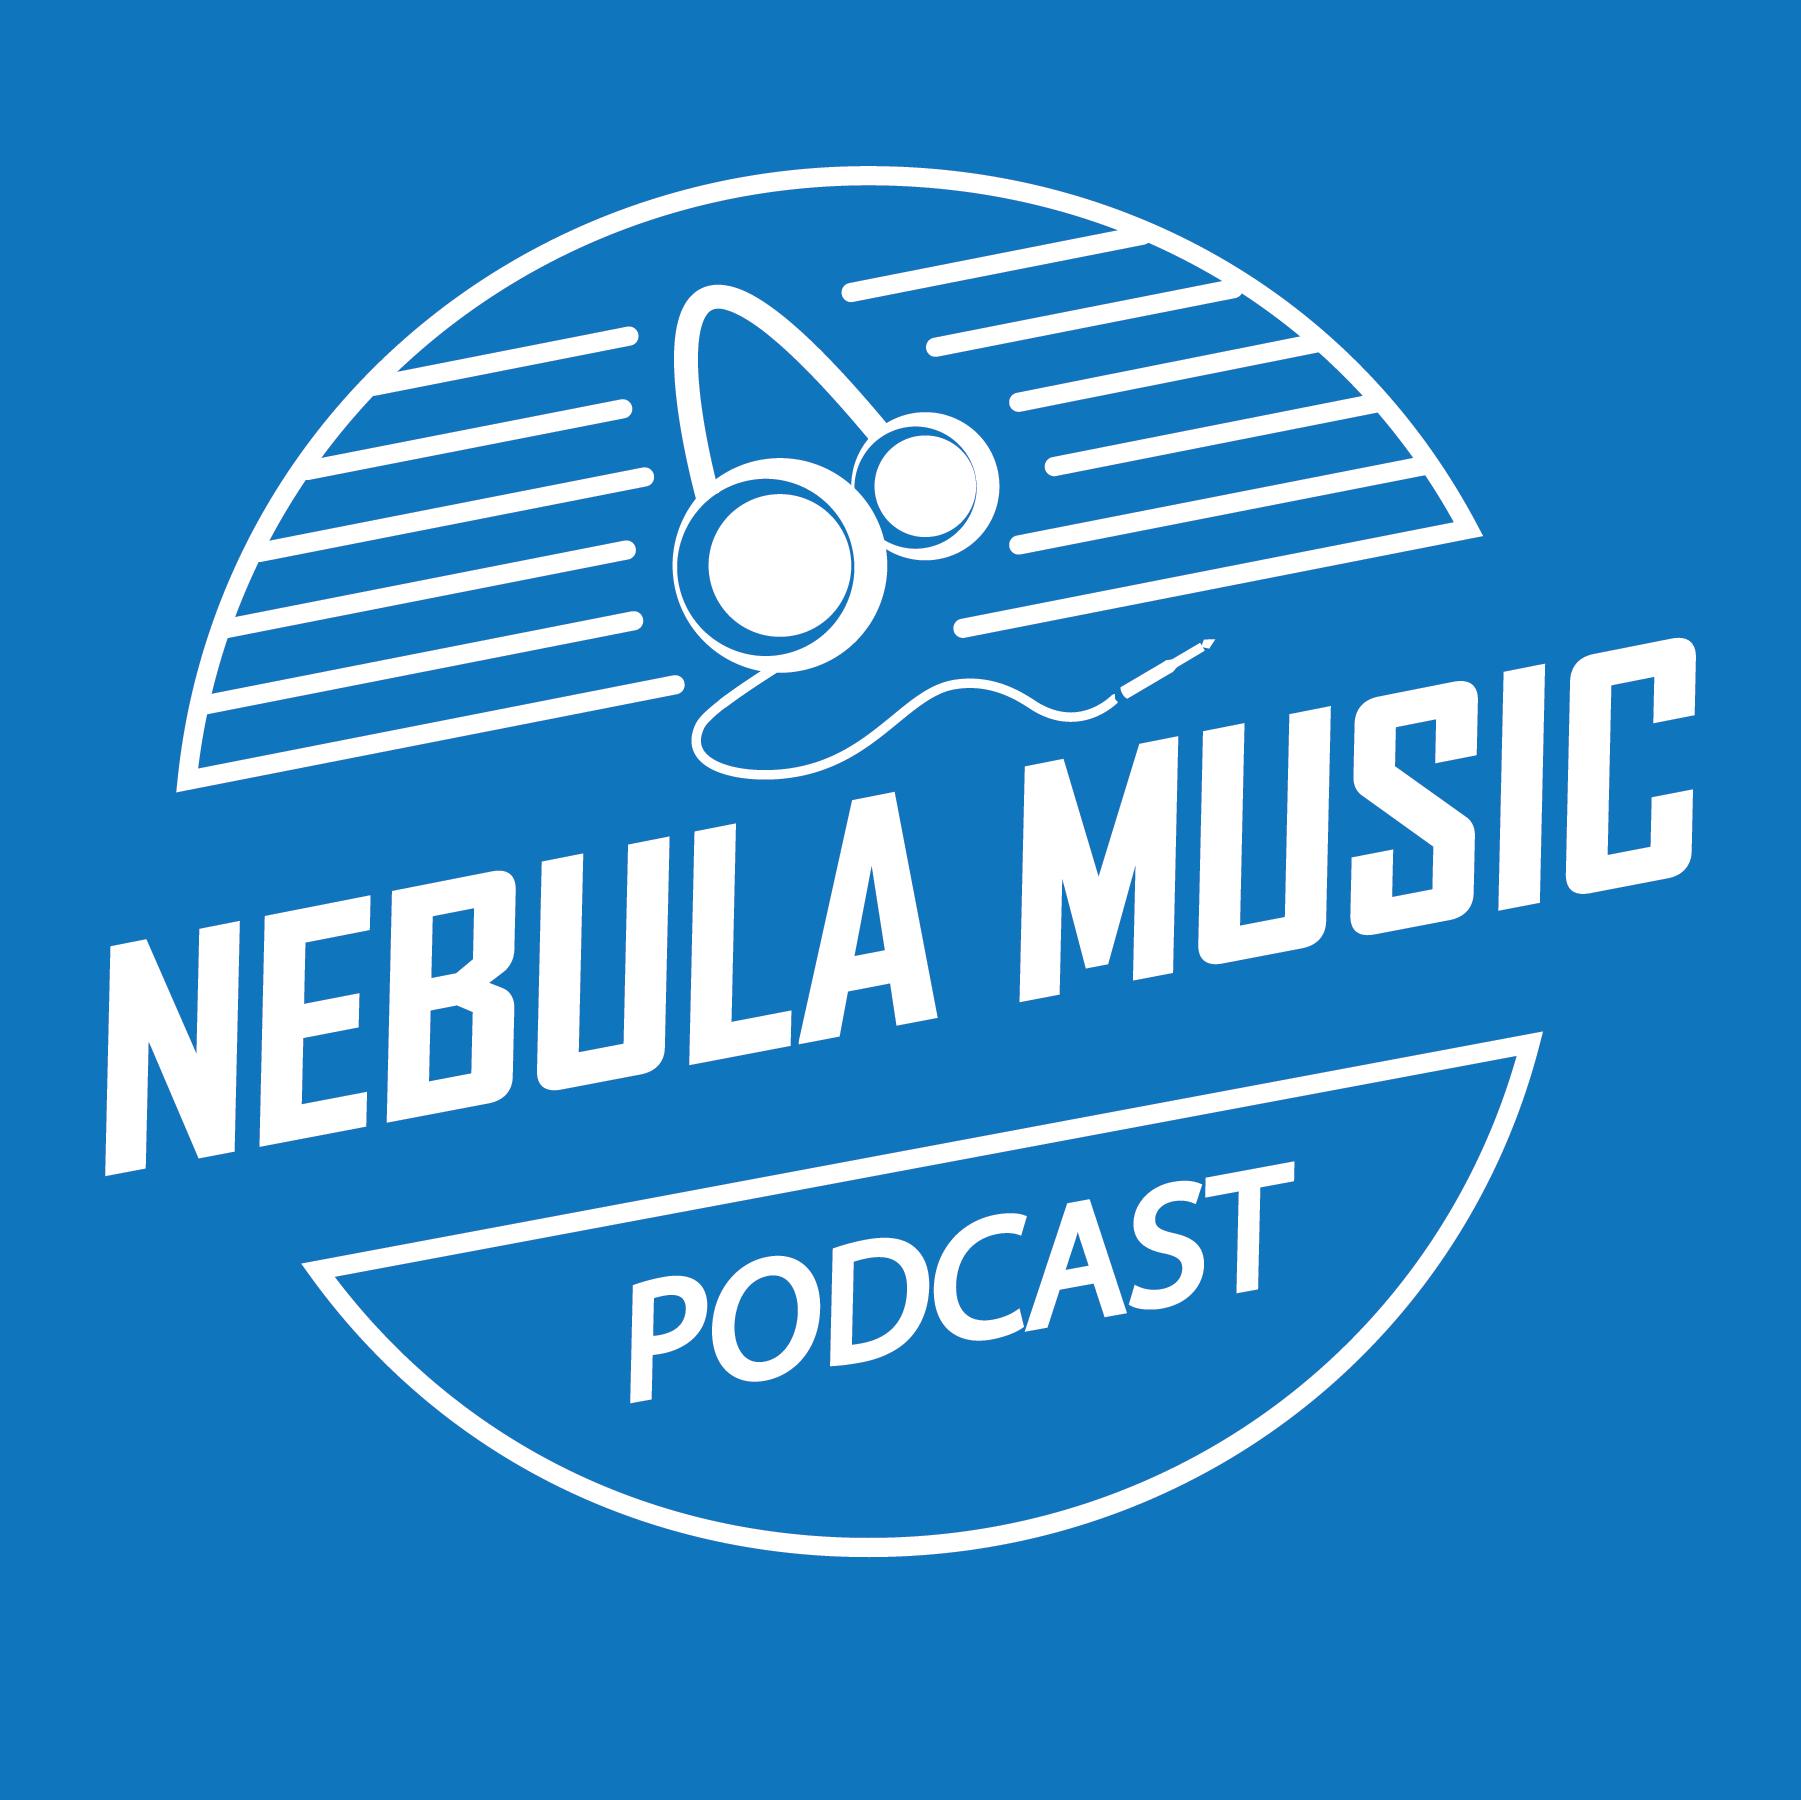 Nebula Music Podcast show art